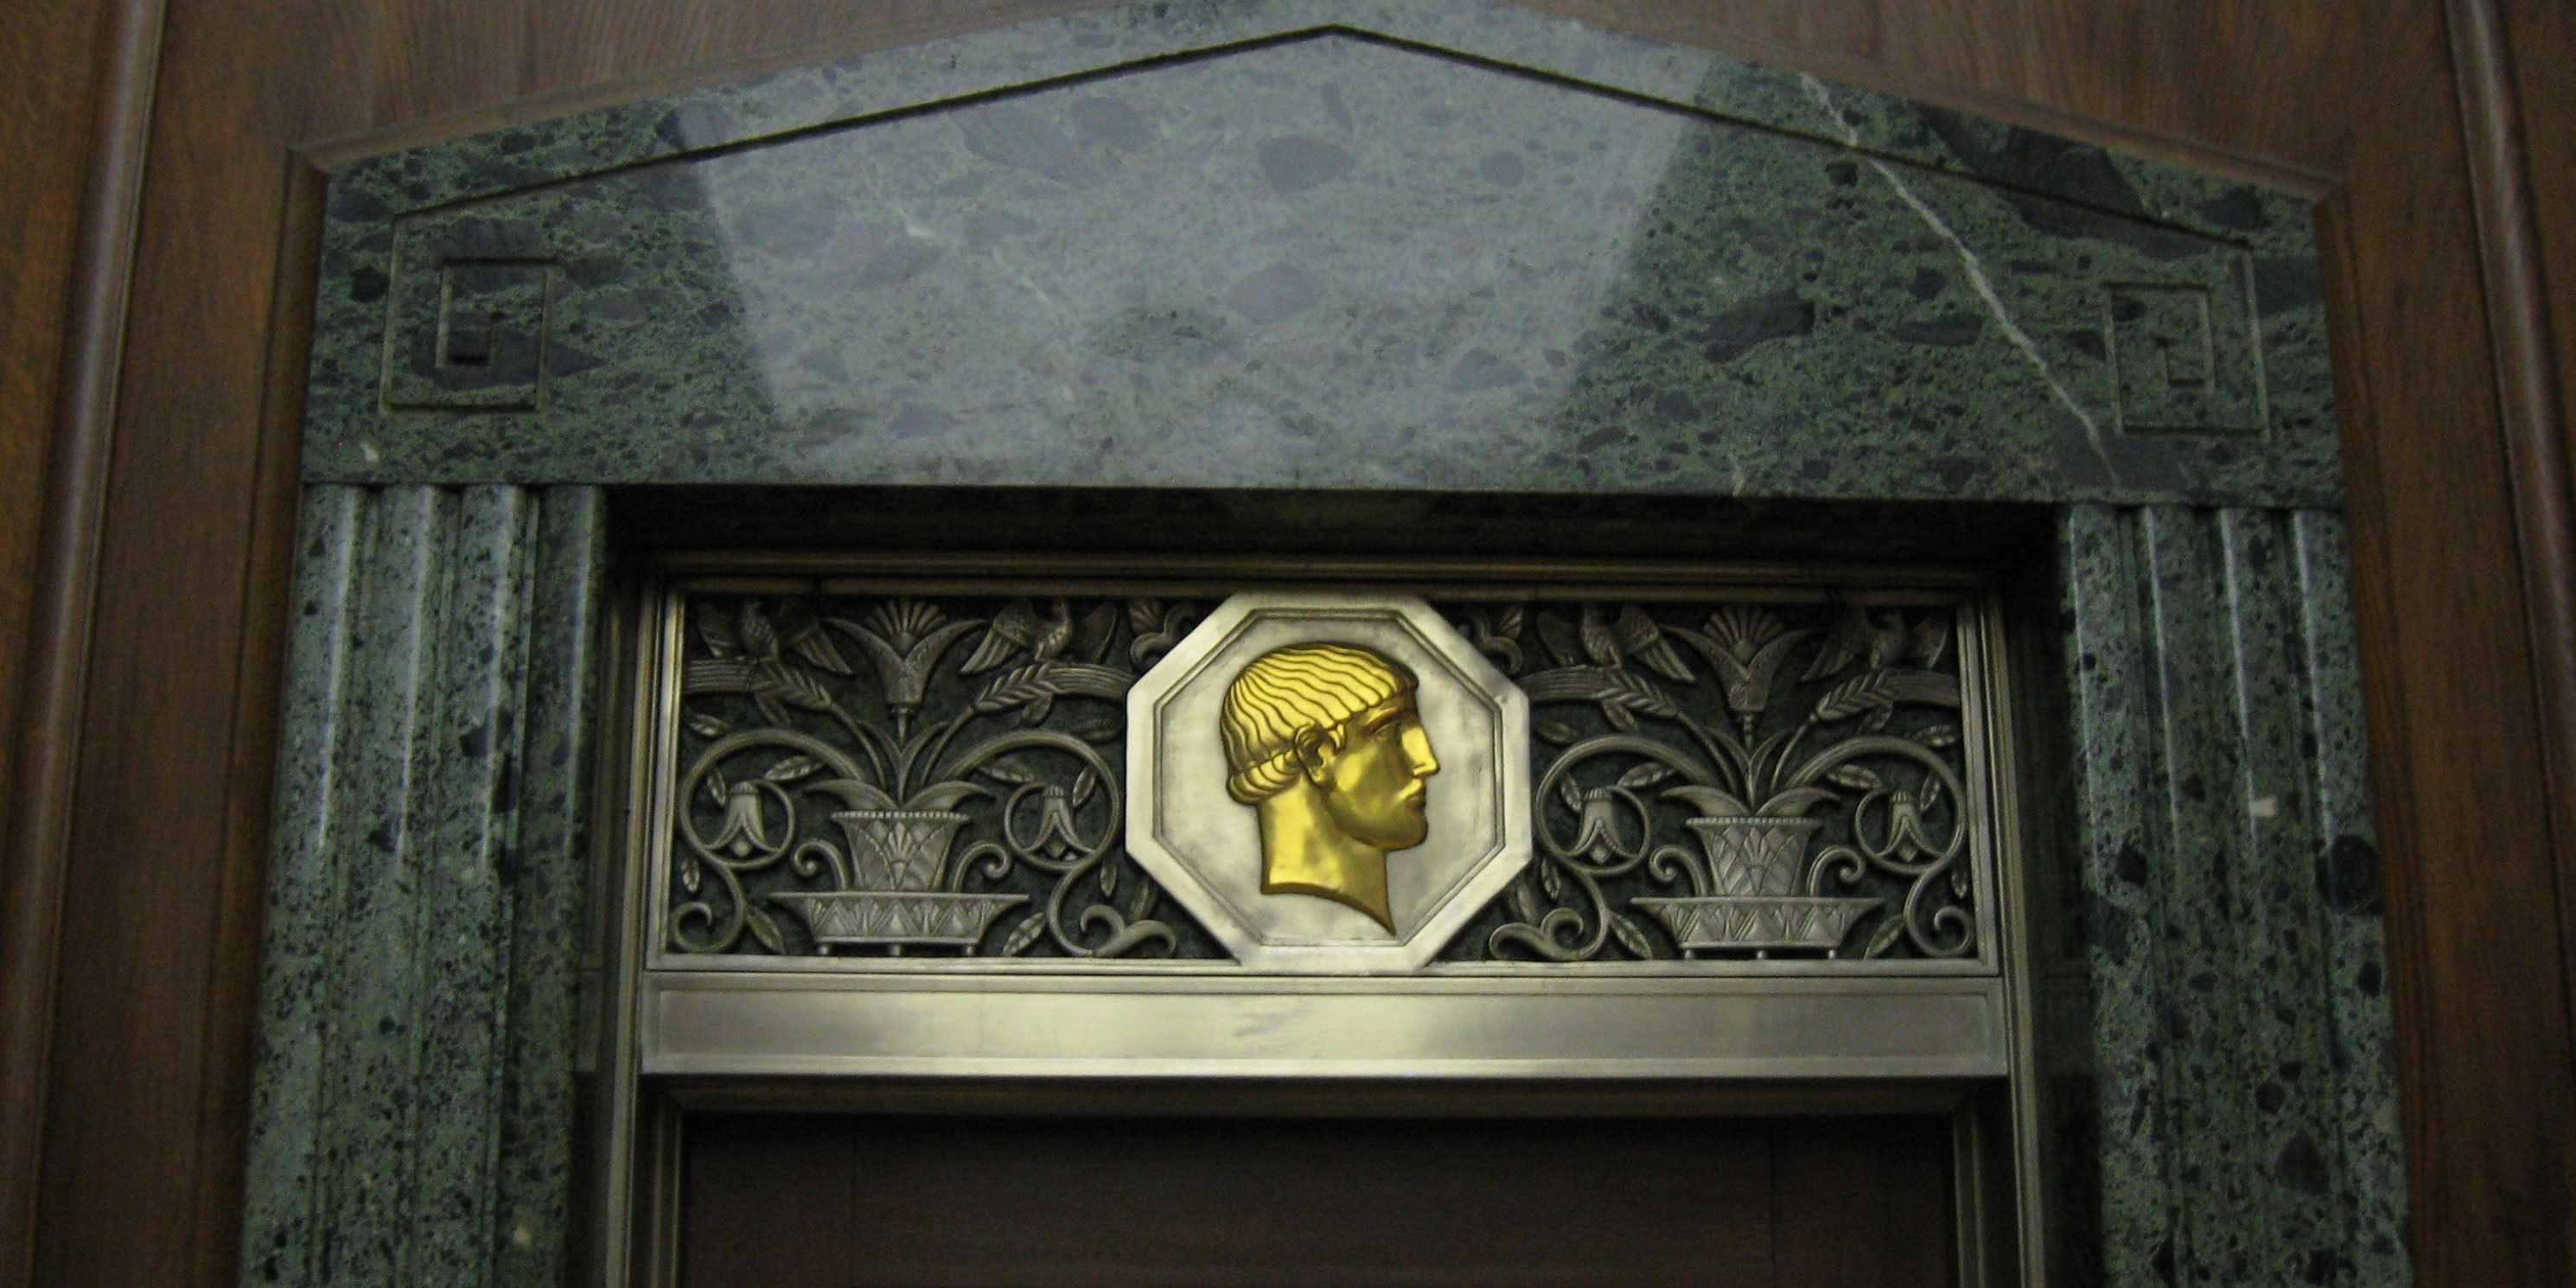 ornate doorframe at 20 Exchange Place